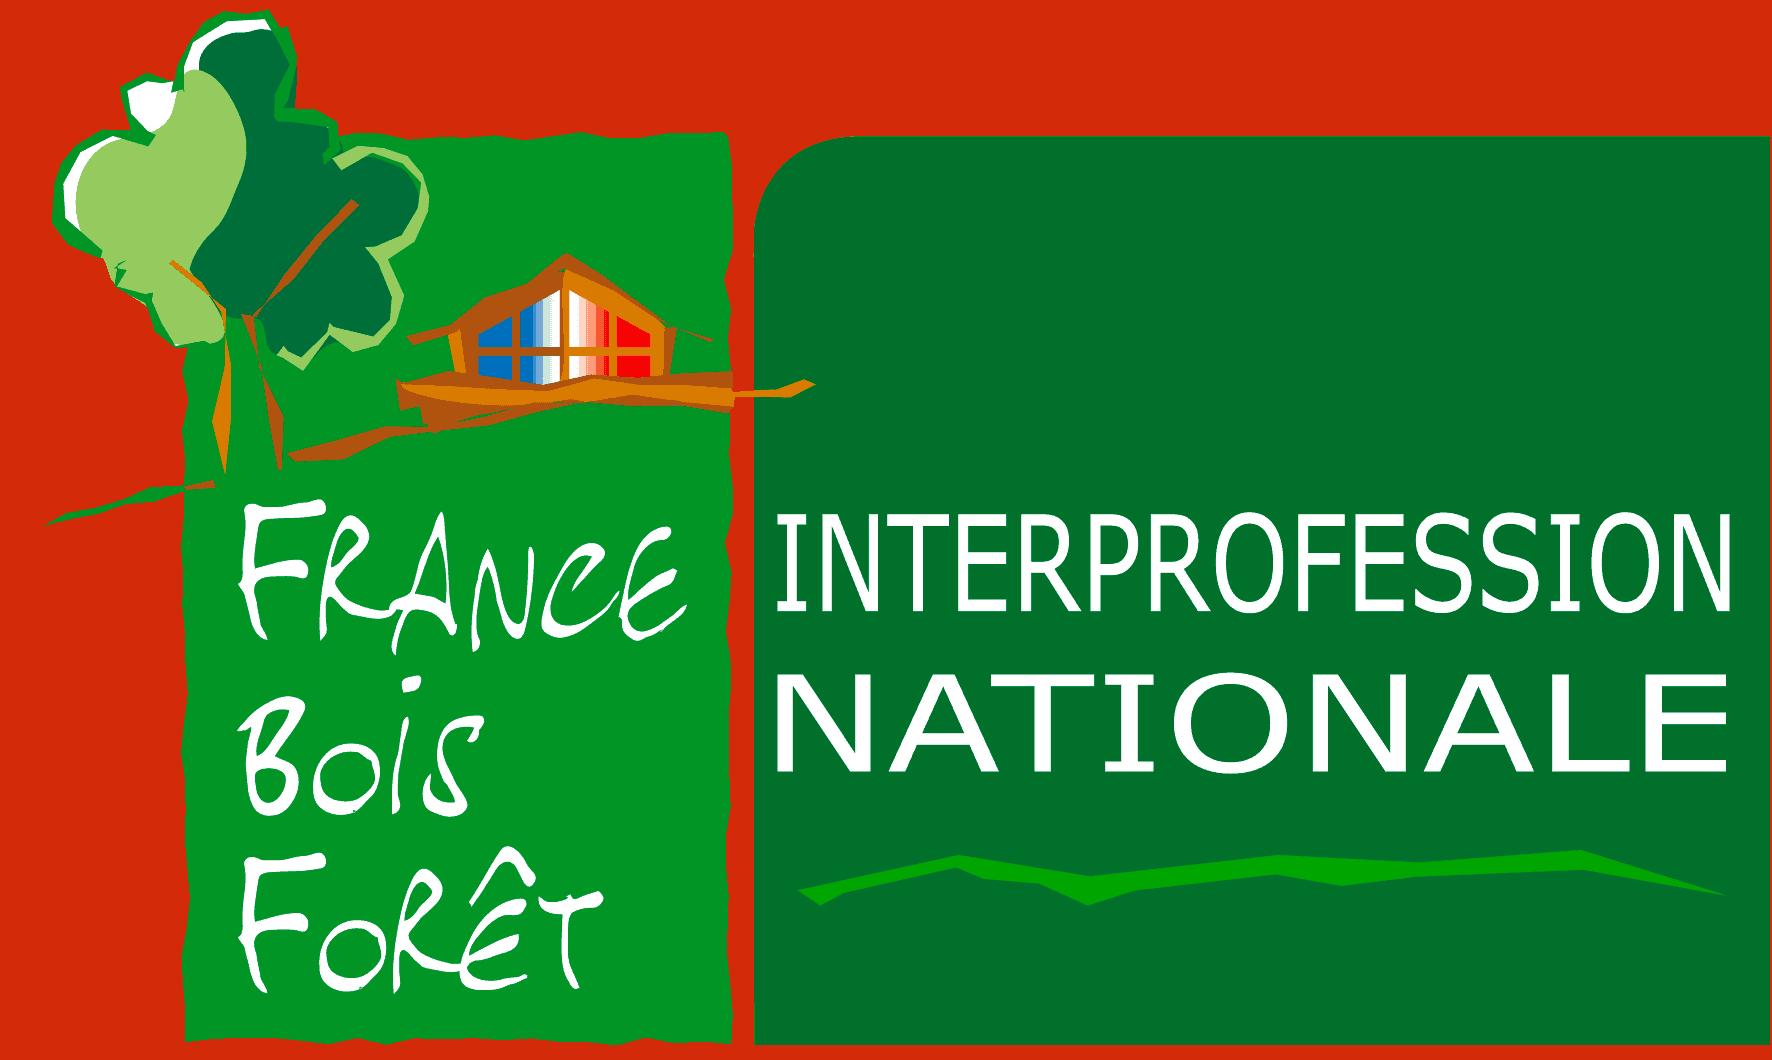 Logo-FBF-Monnet-Seve-Sougy - Monnet-Seve Sougy